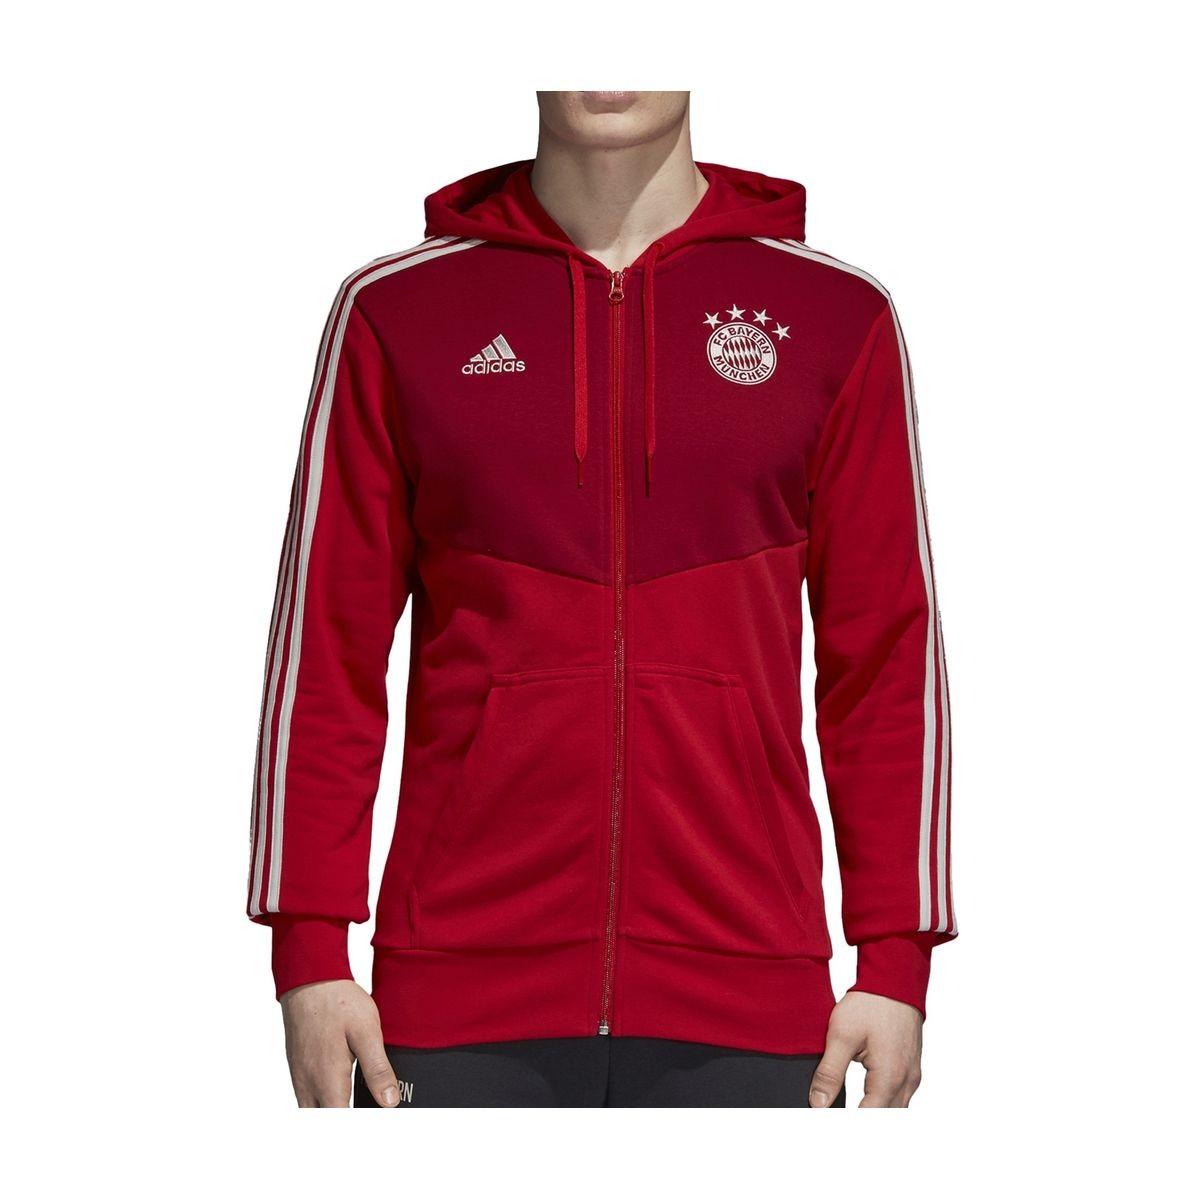 Veste À Capuche Bayern Munich Adidas 3 stripes Rouge